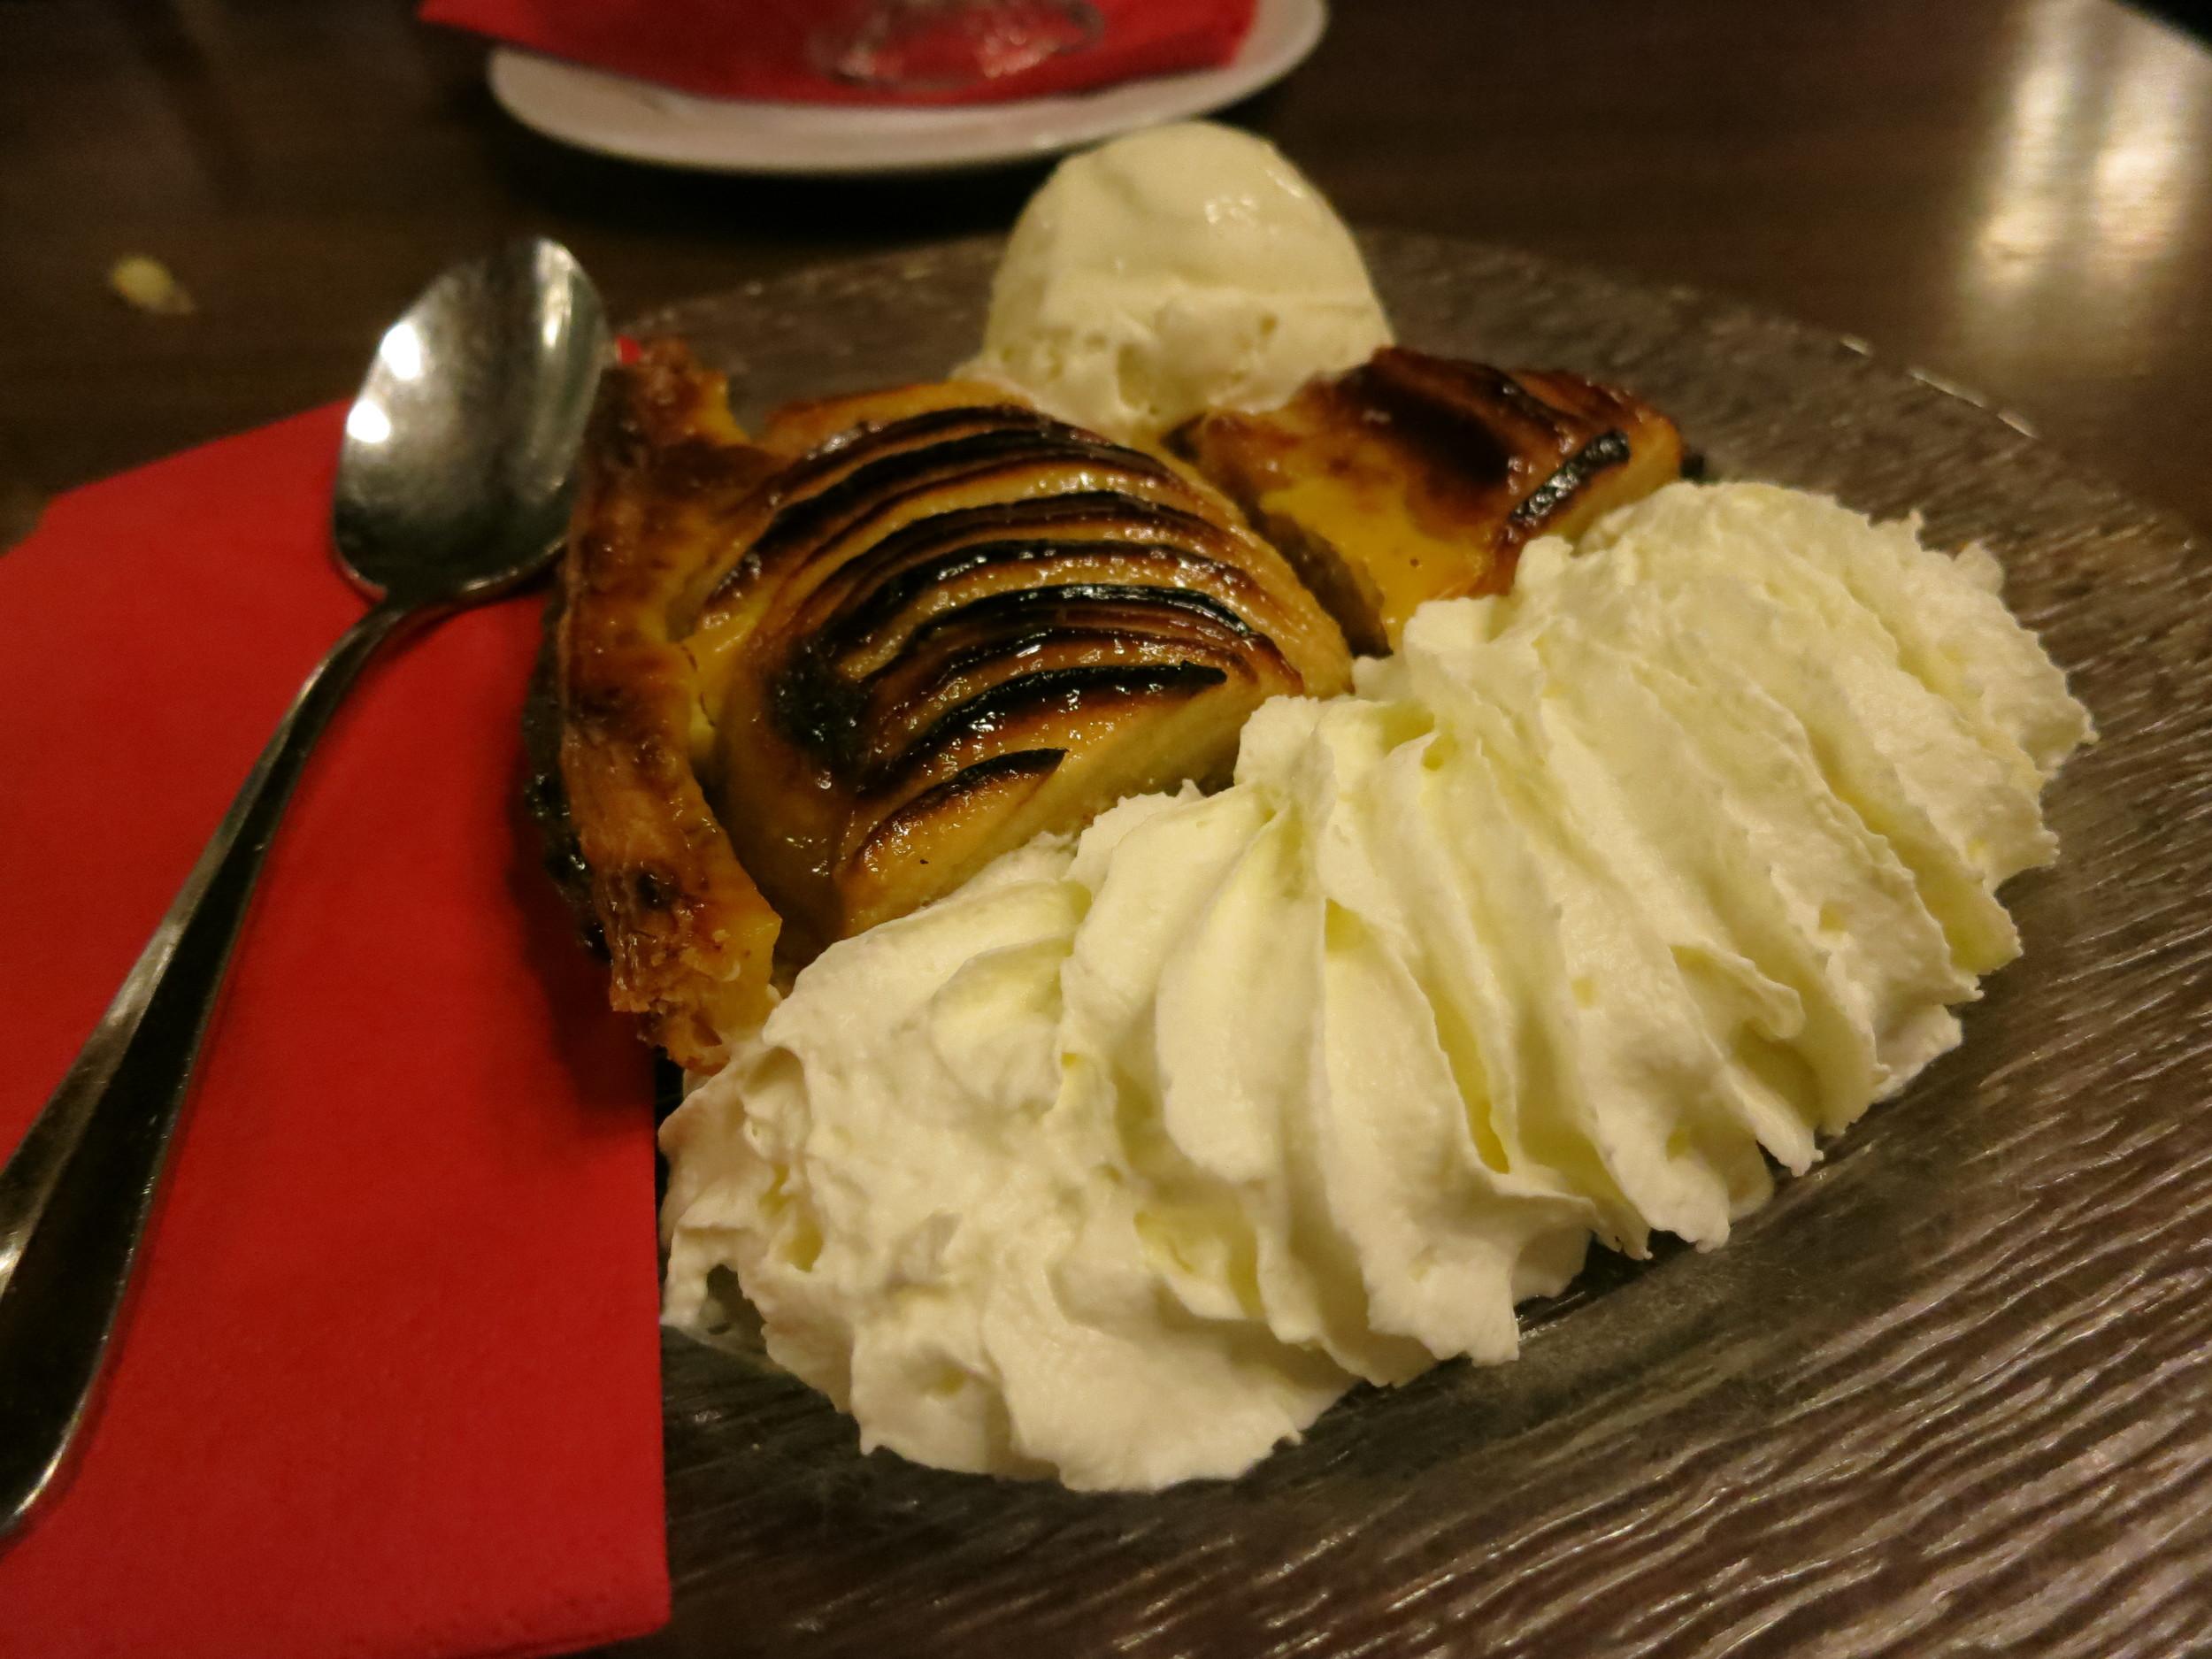 The most amazing apple pie I've ever had.